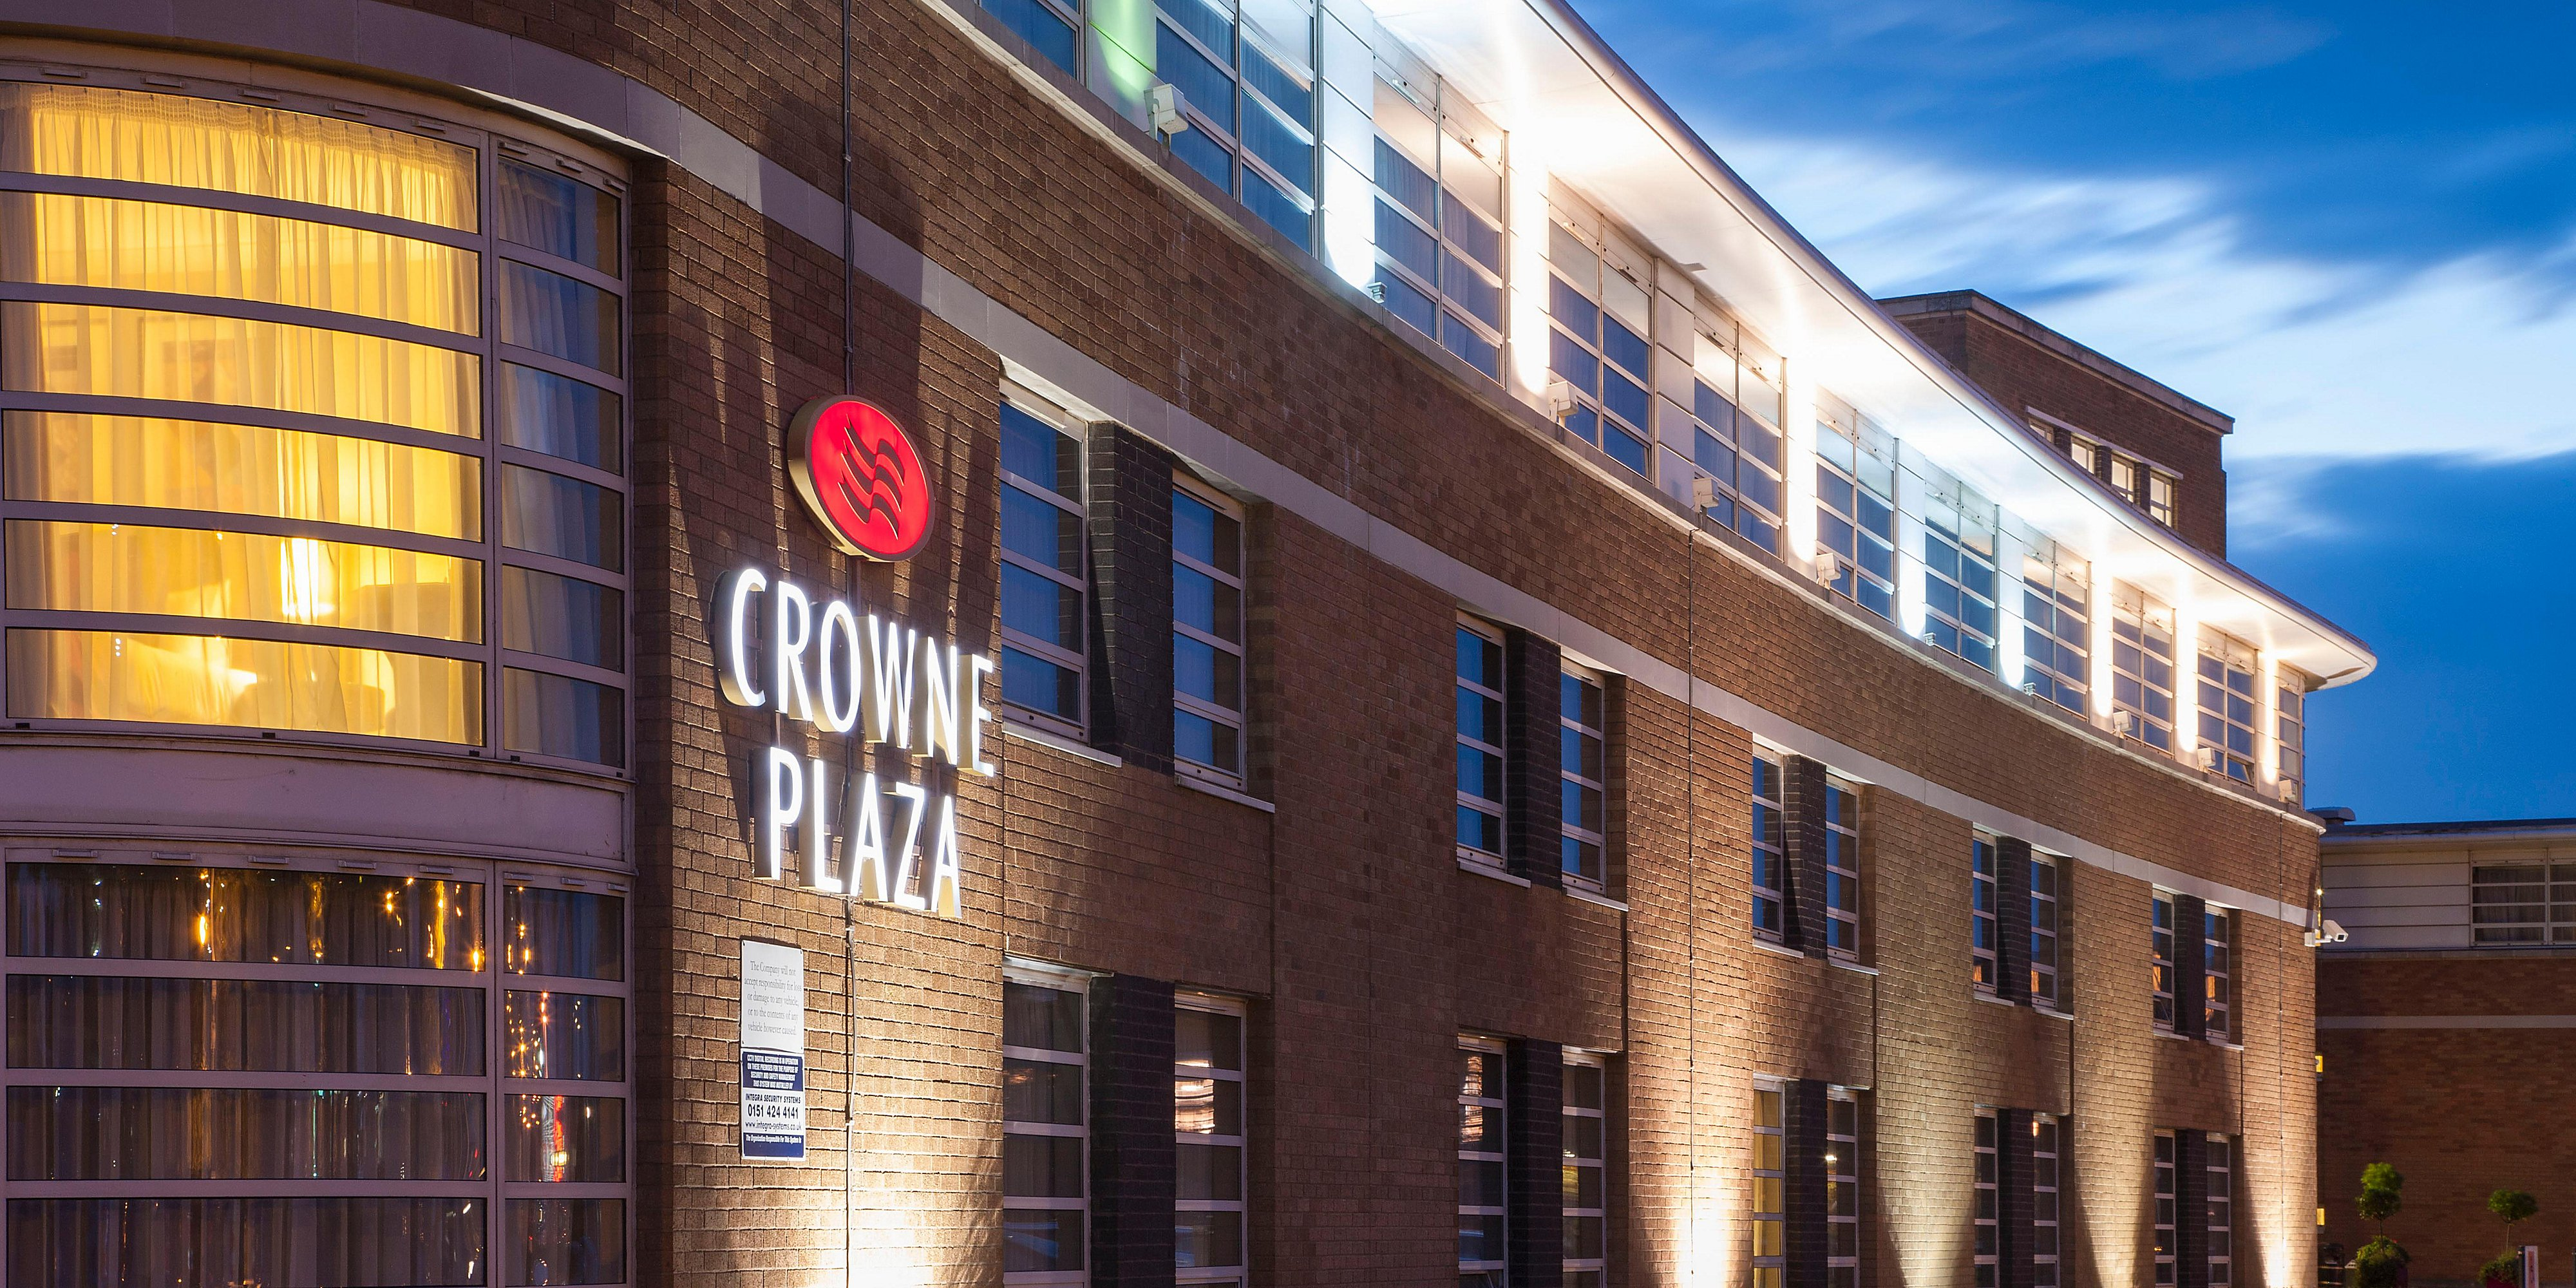 Crowne Plaza Hotel Liverpool John Lennon Airport